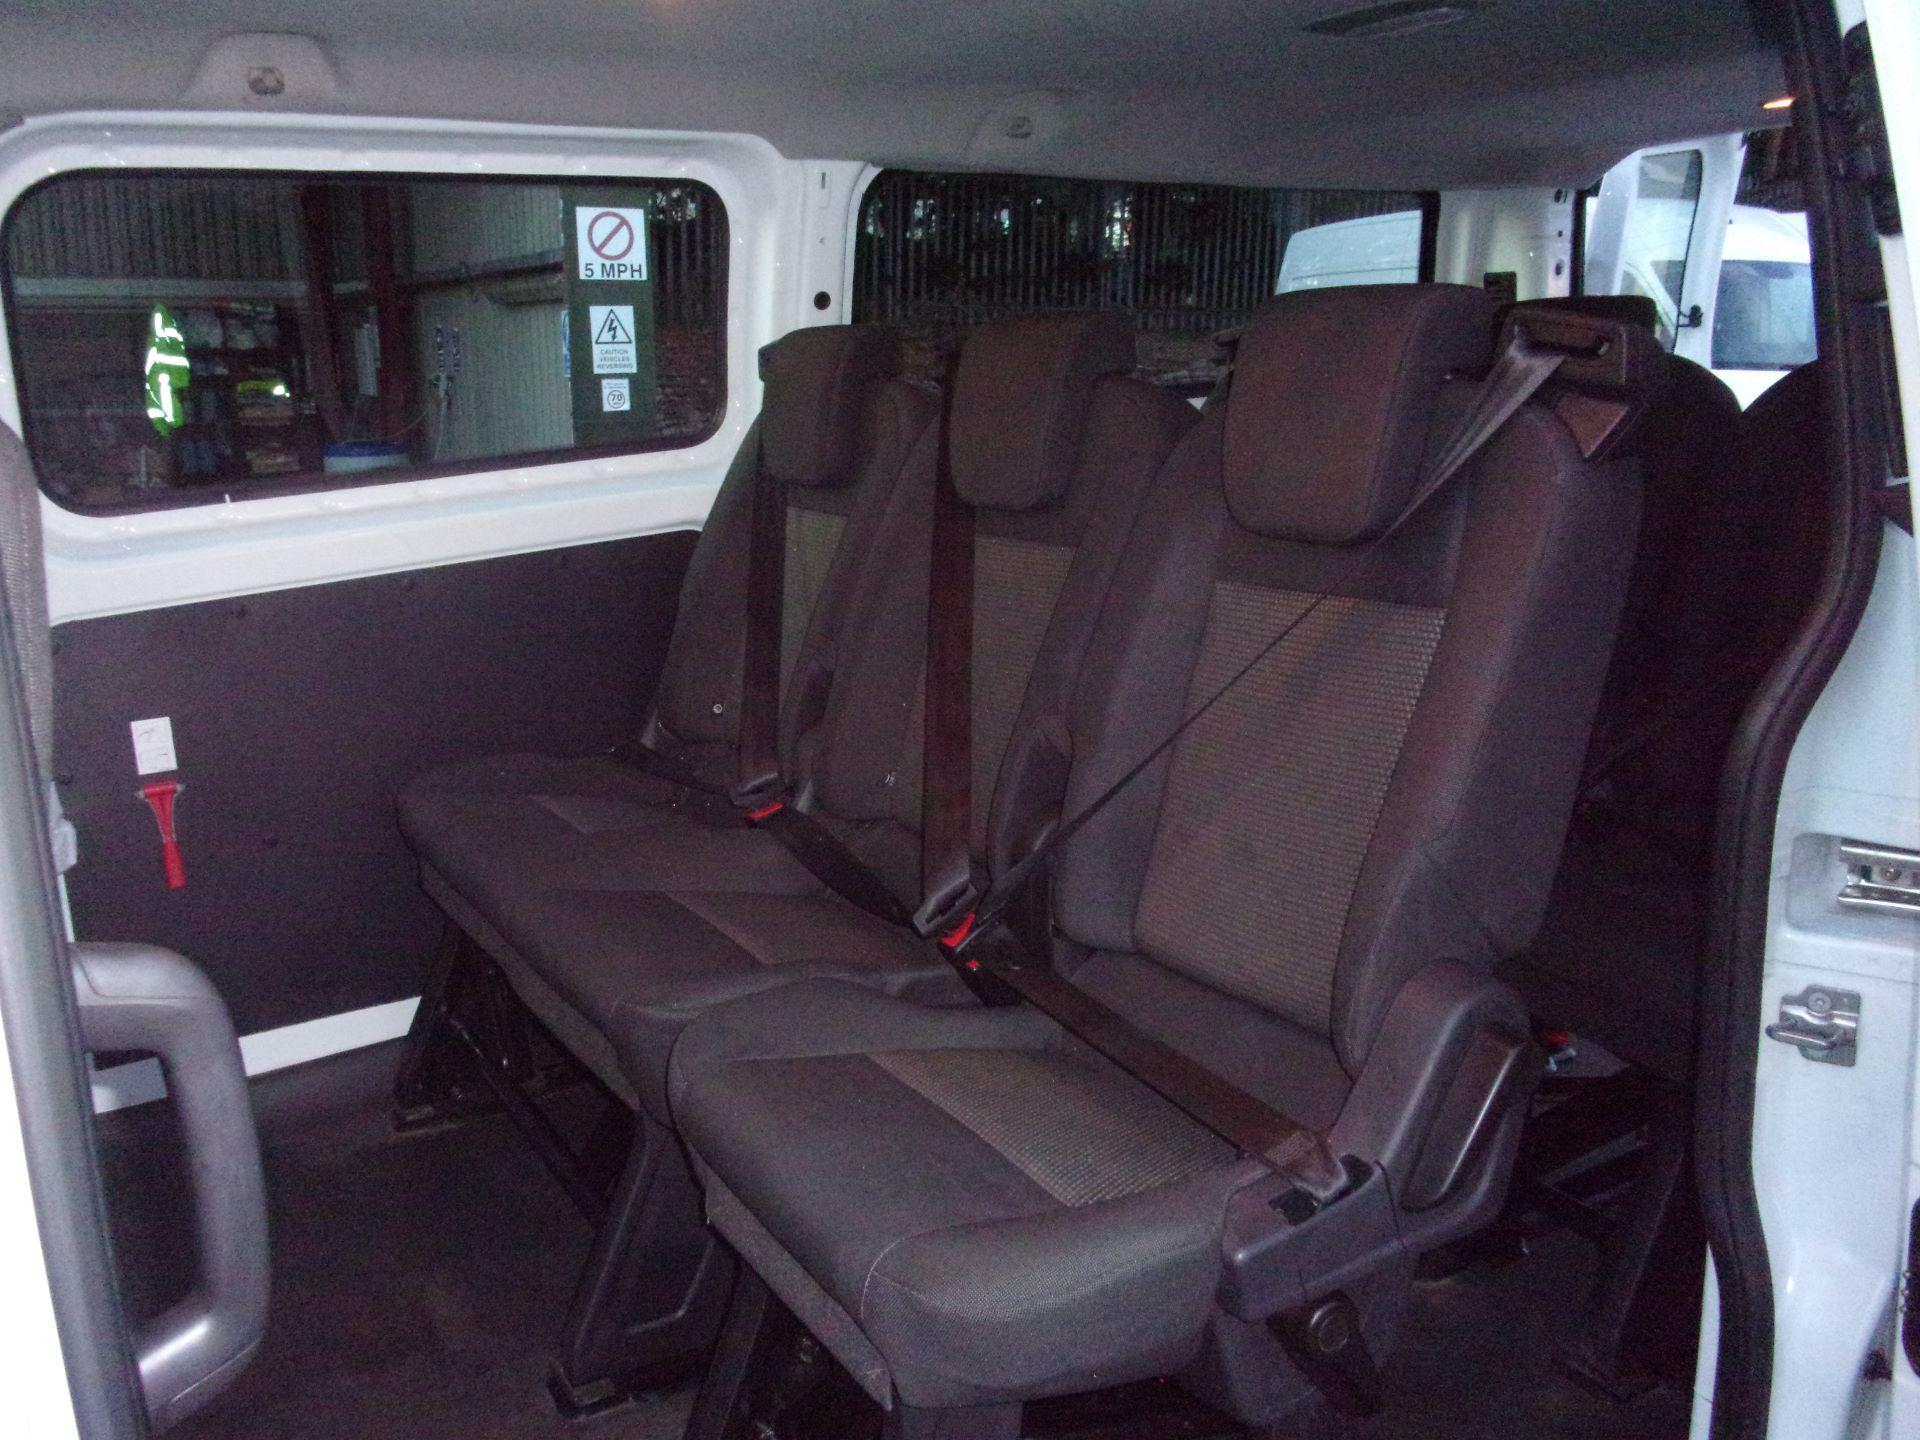 2017 Ford Transit Custom 310 L2 DIESEL FWD 2.0 TDCI 130PS LOW ROOF KOMBI EURO 6 (FG67ERU) Image 17